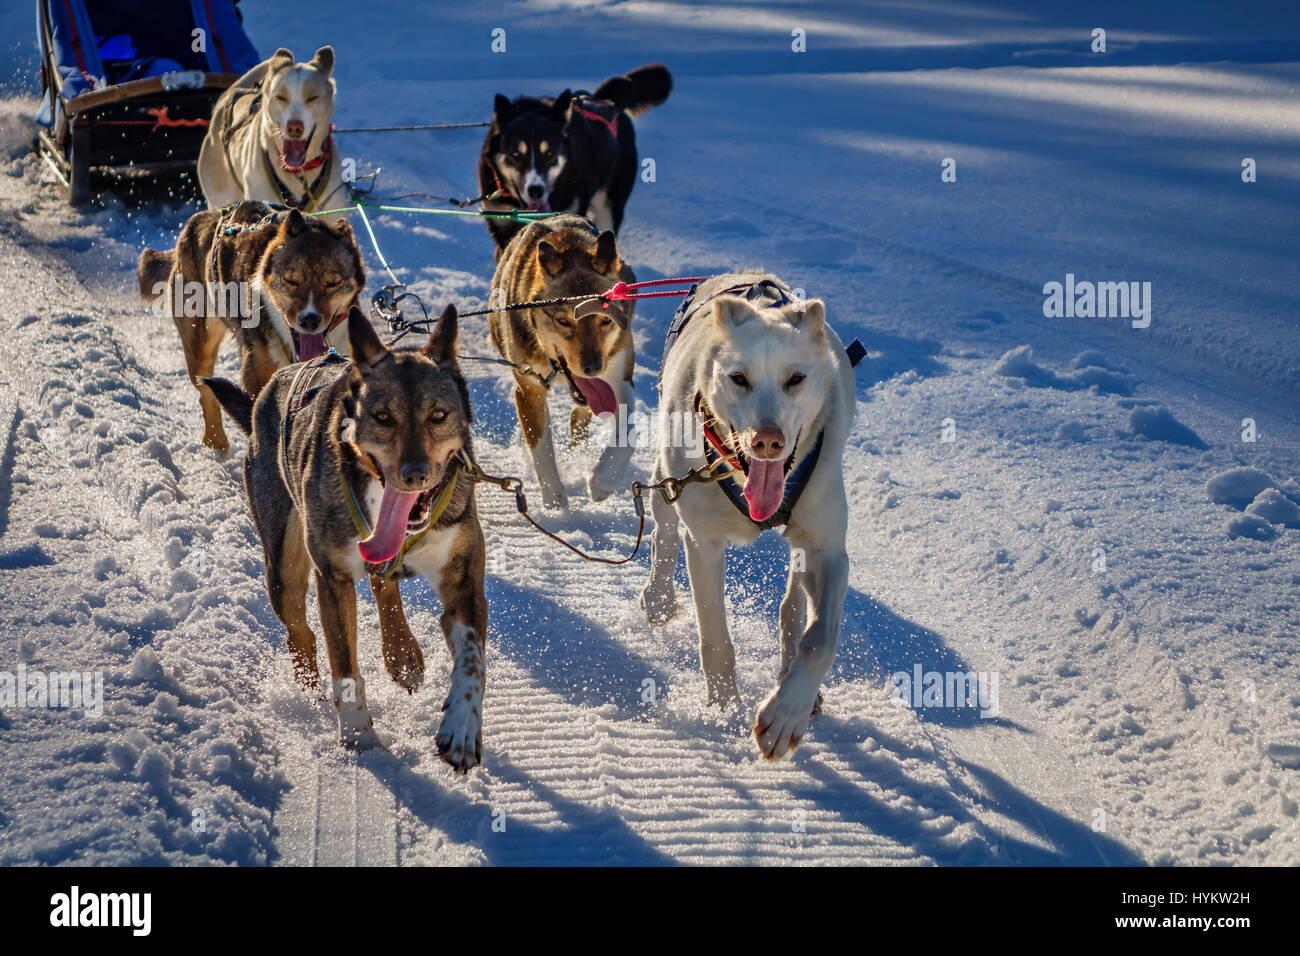 Husky Schlittenhunde, Lappland, Schweden Stockfoto